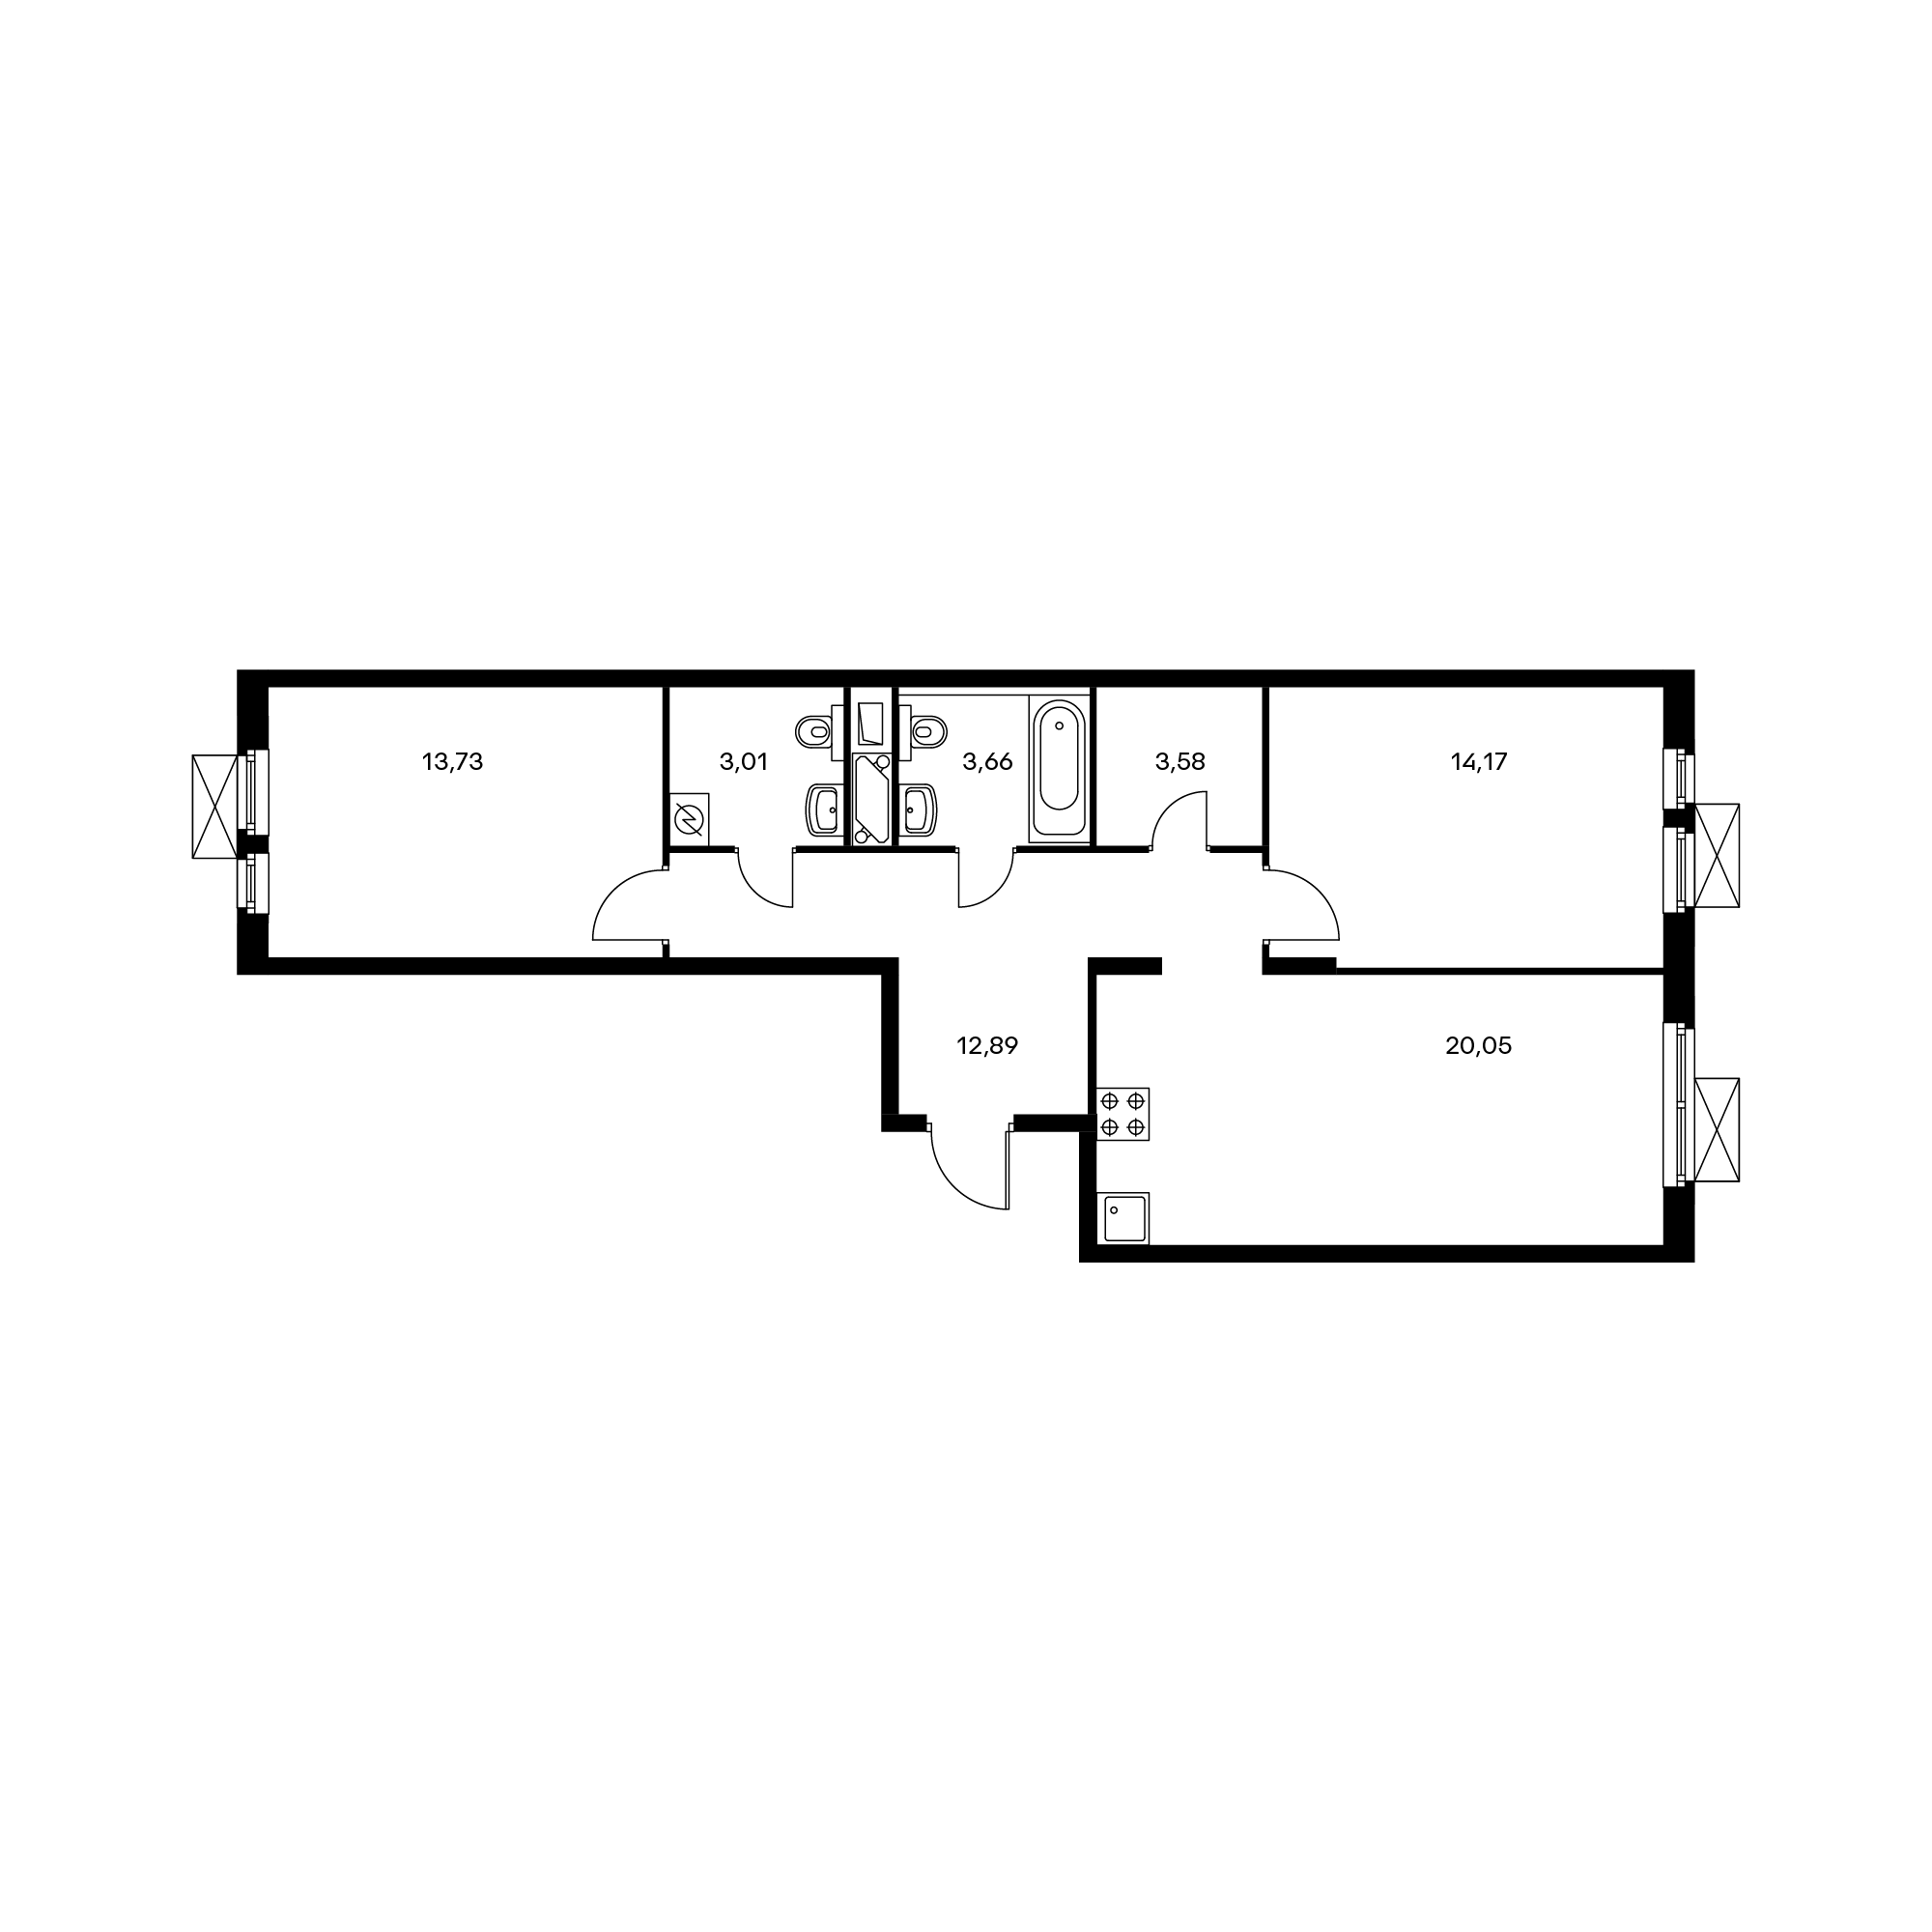 2EL2_6.6_1